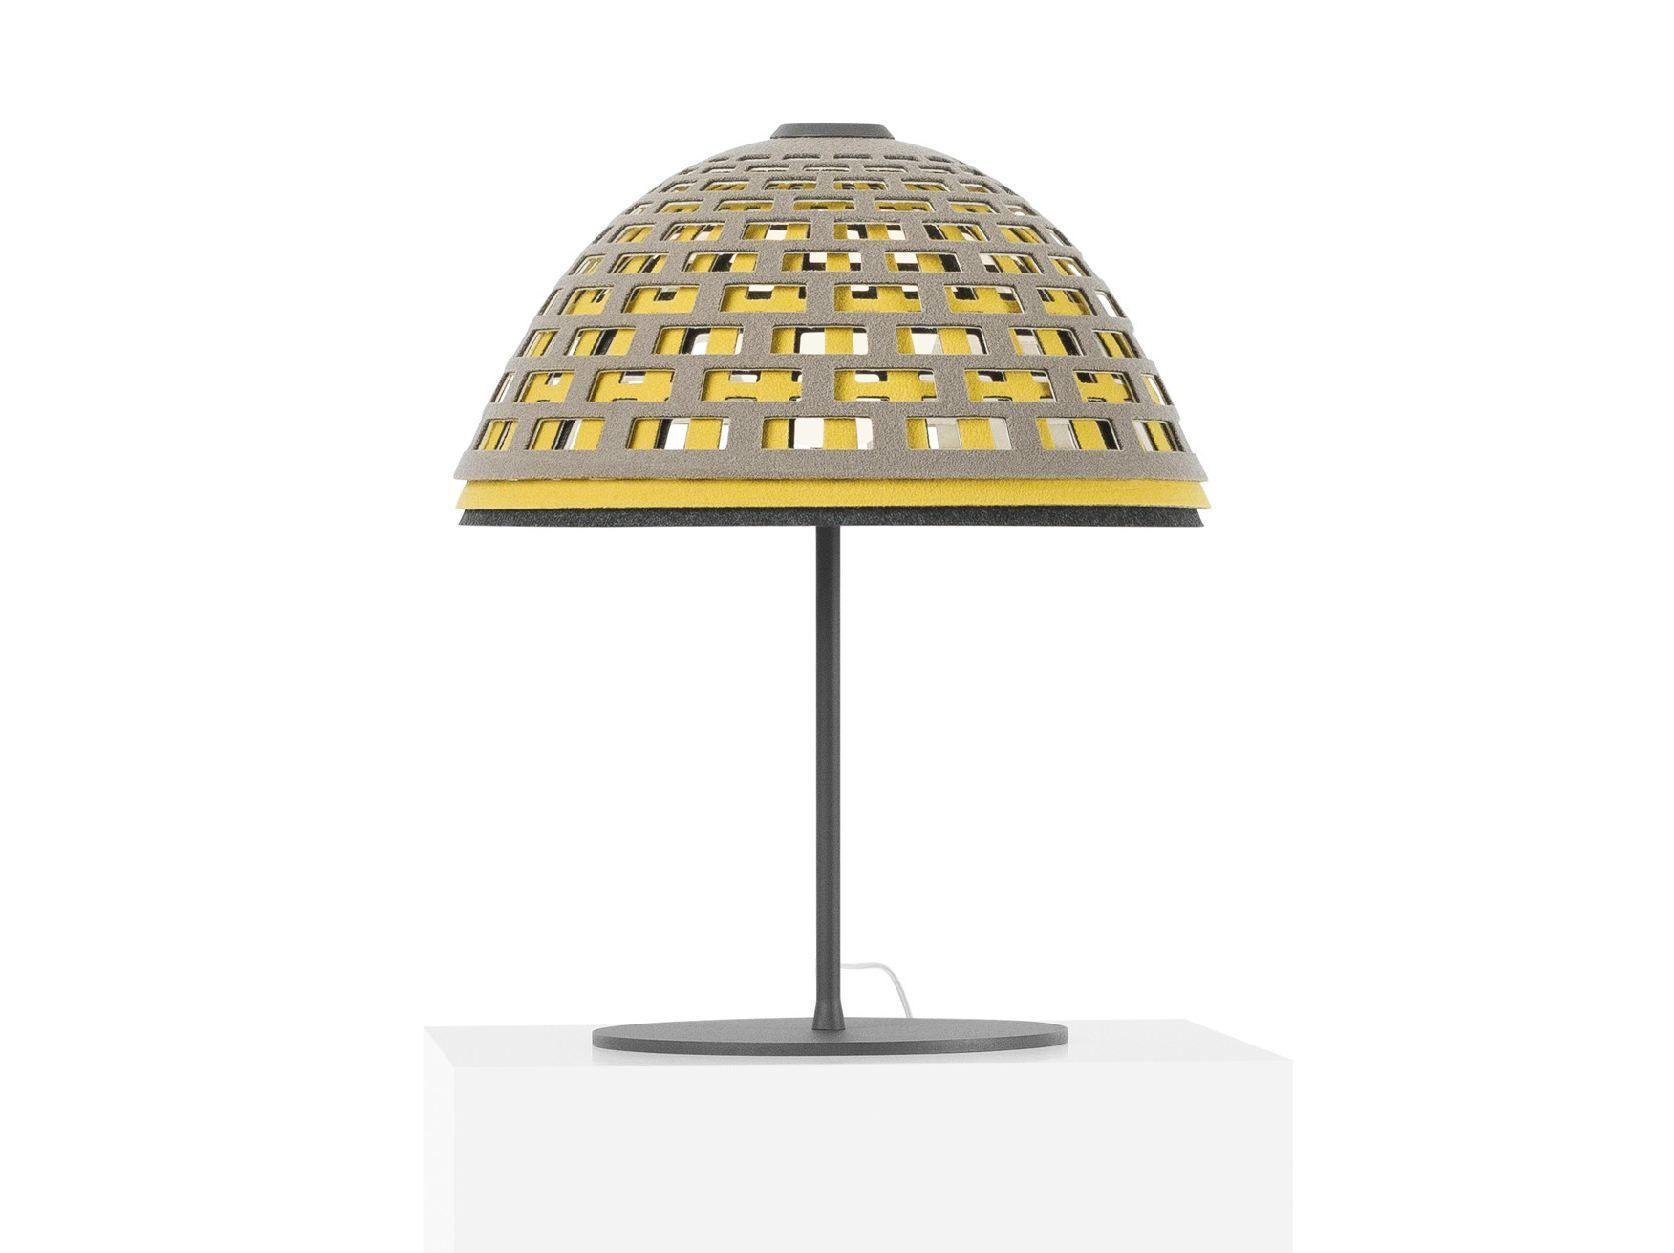 LAMPE DE TABLE EN FEUTRE COLLECTION LOOS BY ZERO   DESIGN LUCA NICHETTO